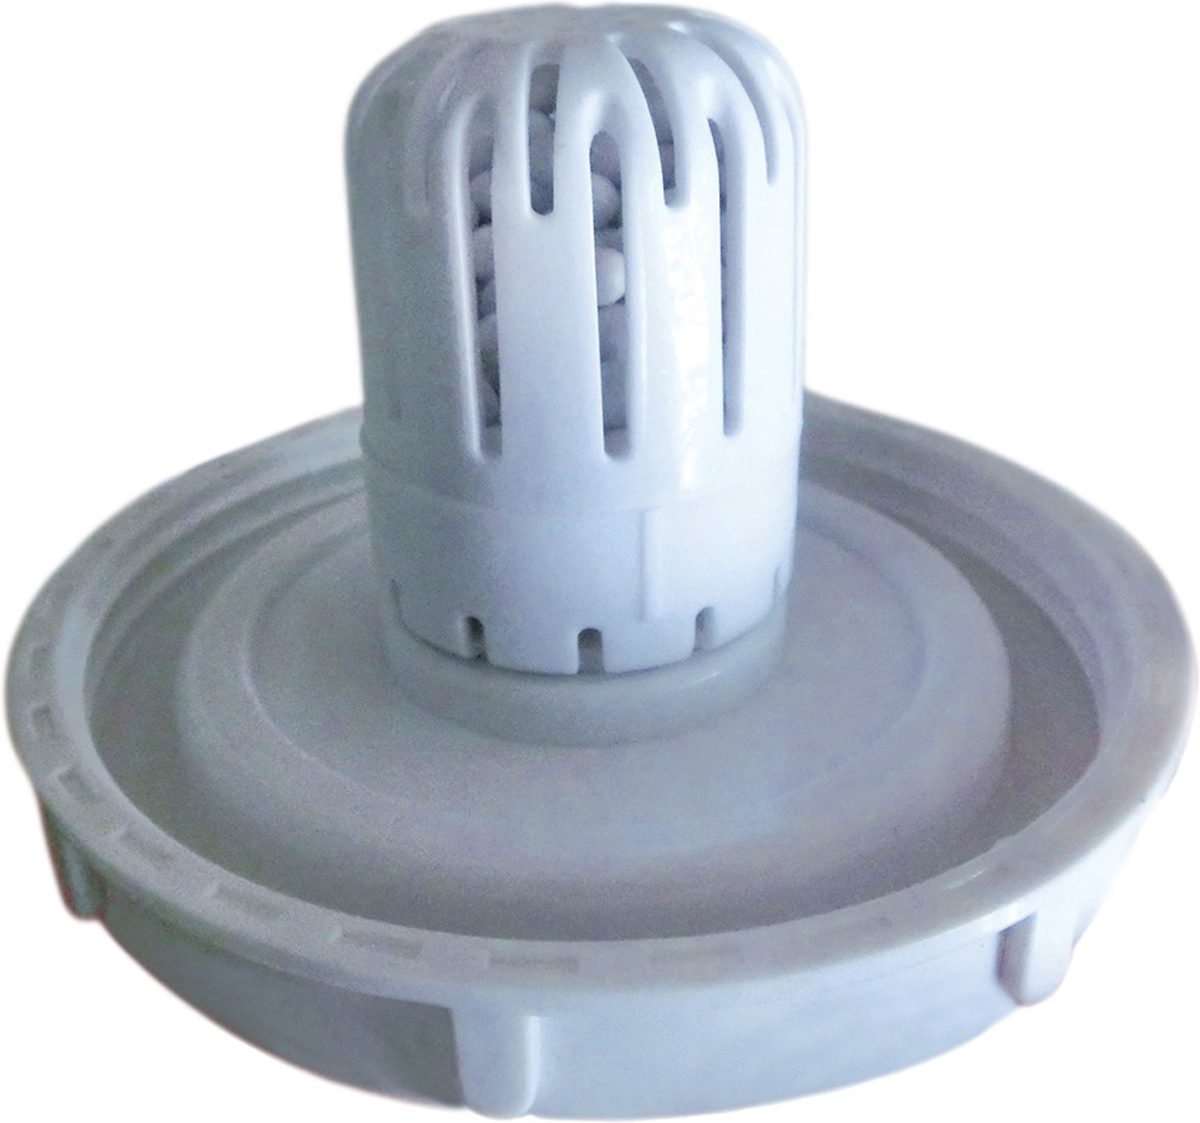 Timberk TMS FL12 фильтр-картридж для увлажнителя THU UL 12 steba lb 6 фильтр для увлажнителя